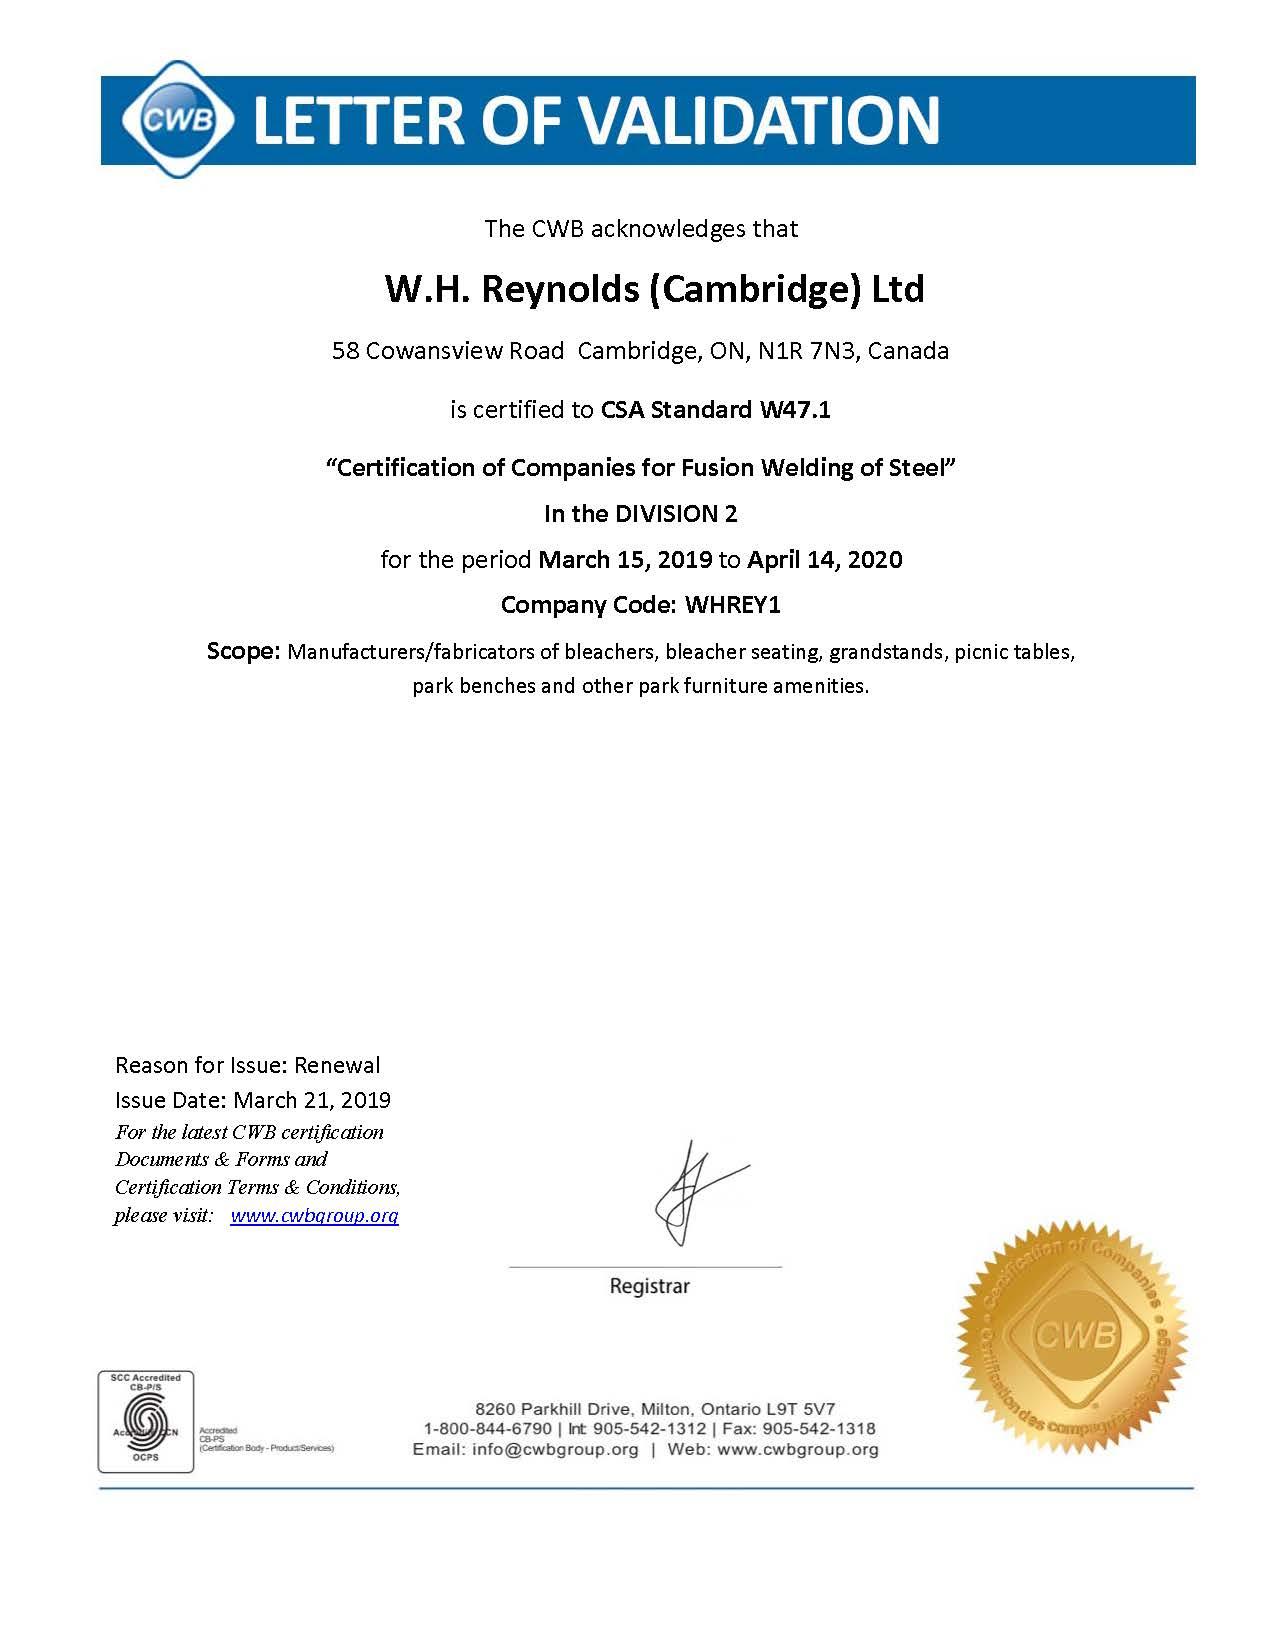 W.H. Reynolds (Cambridge) Ltd. - CWB Letter of Validation 2019-2020